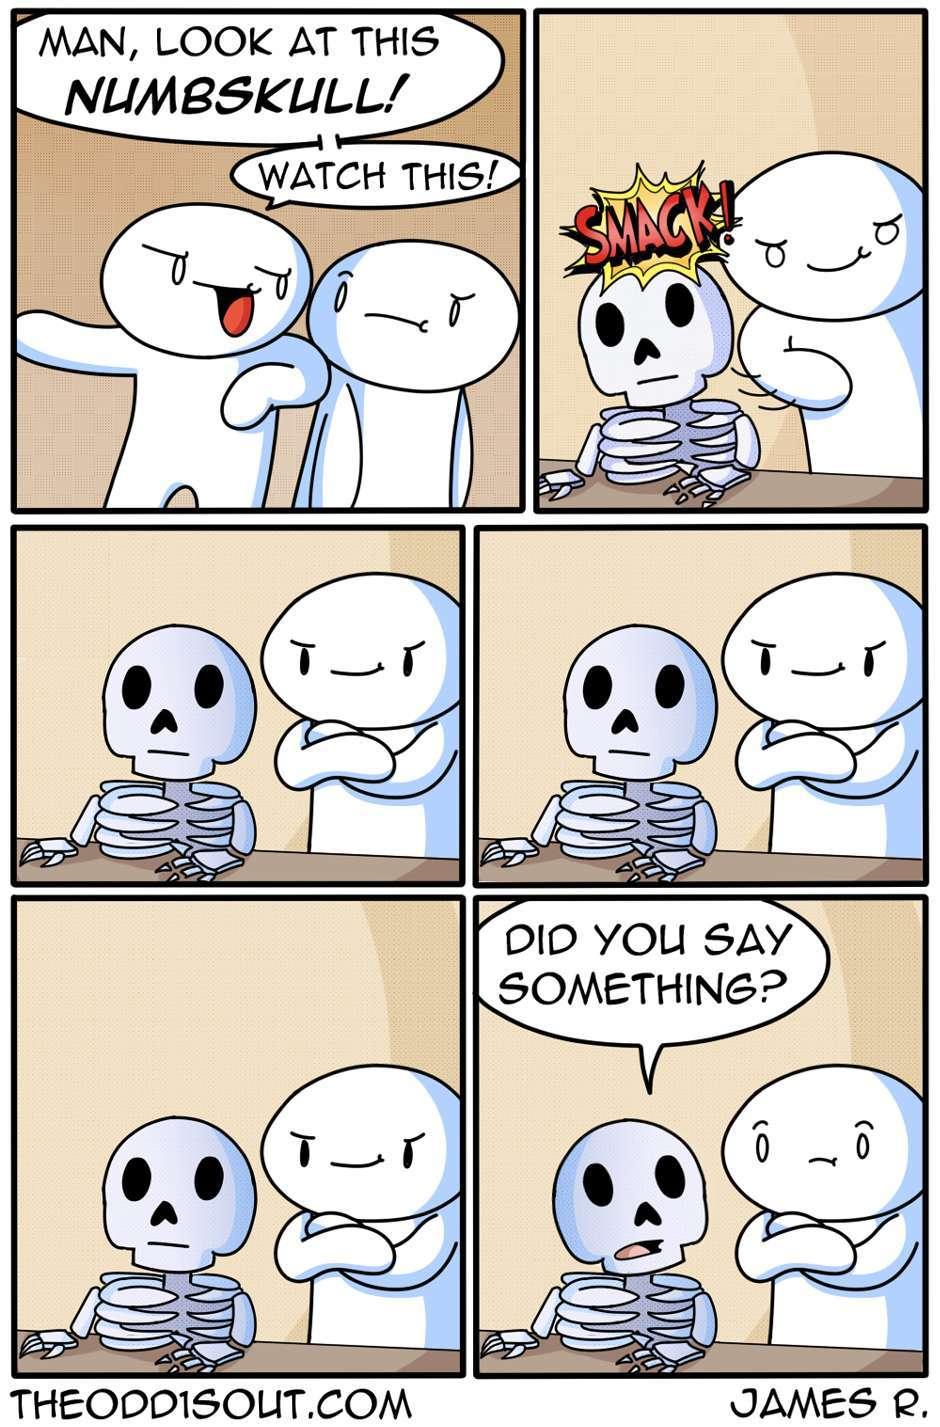 he's a thick skull - meme